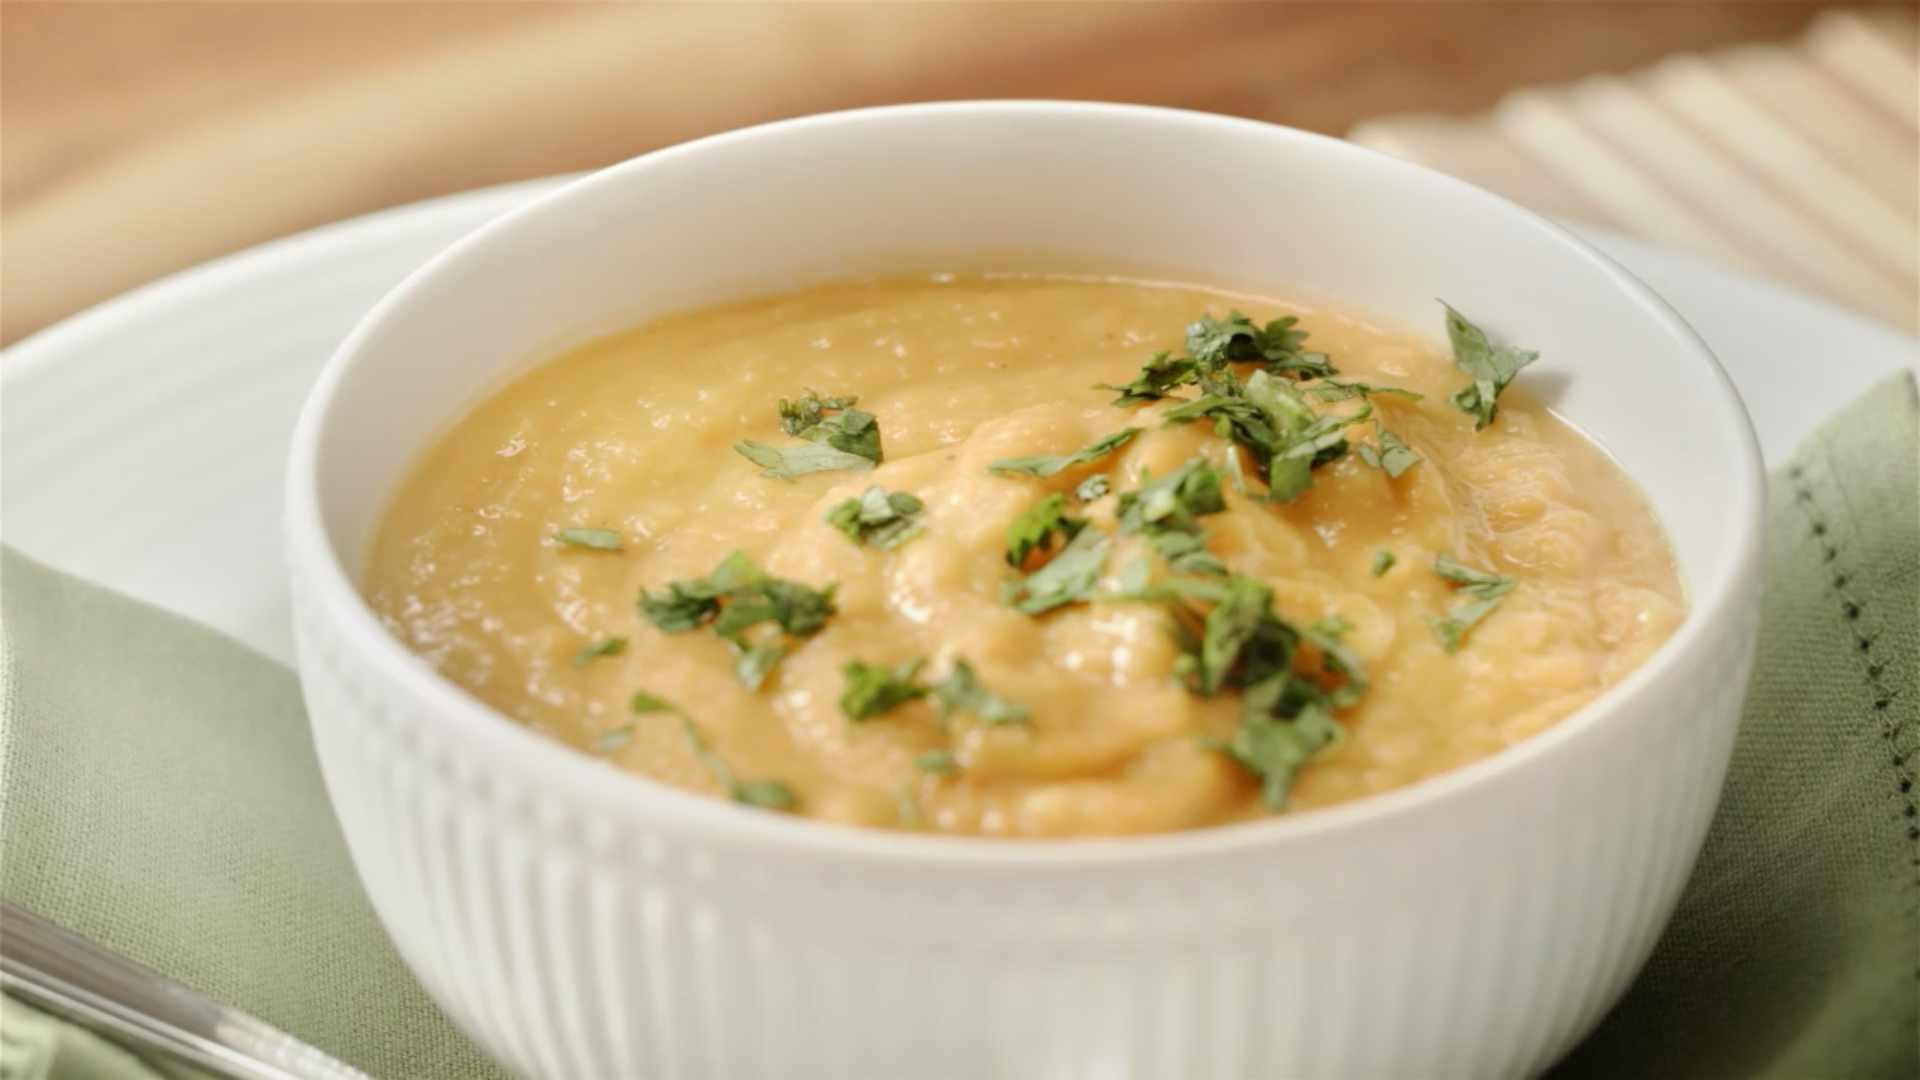 making-mayo-recipes-butternut-squash-soup-16-x-9